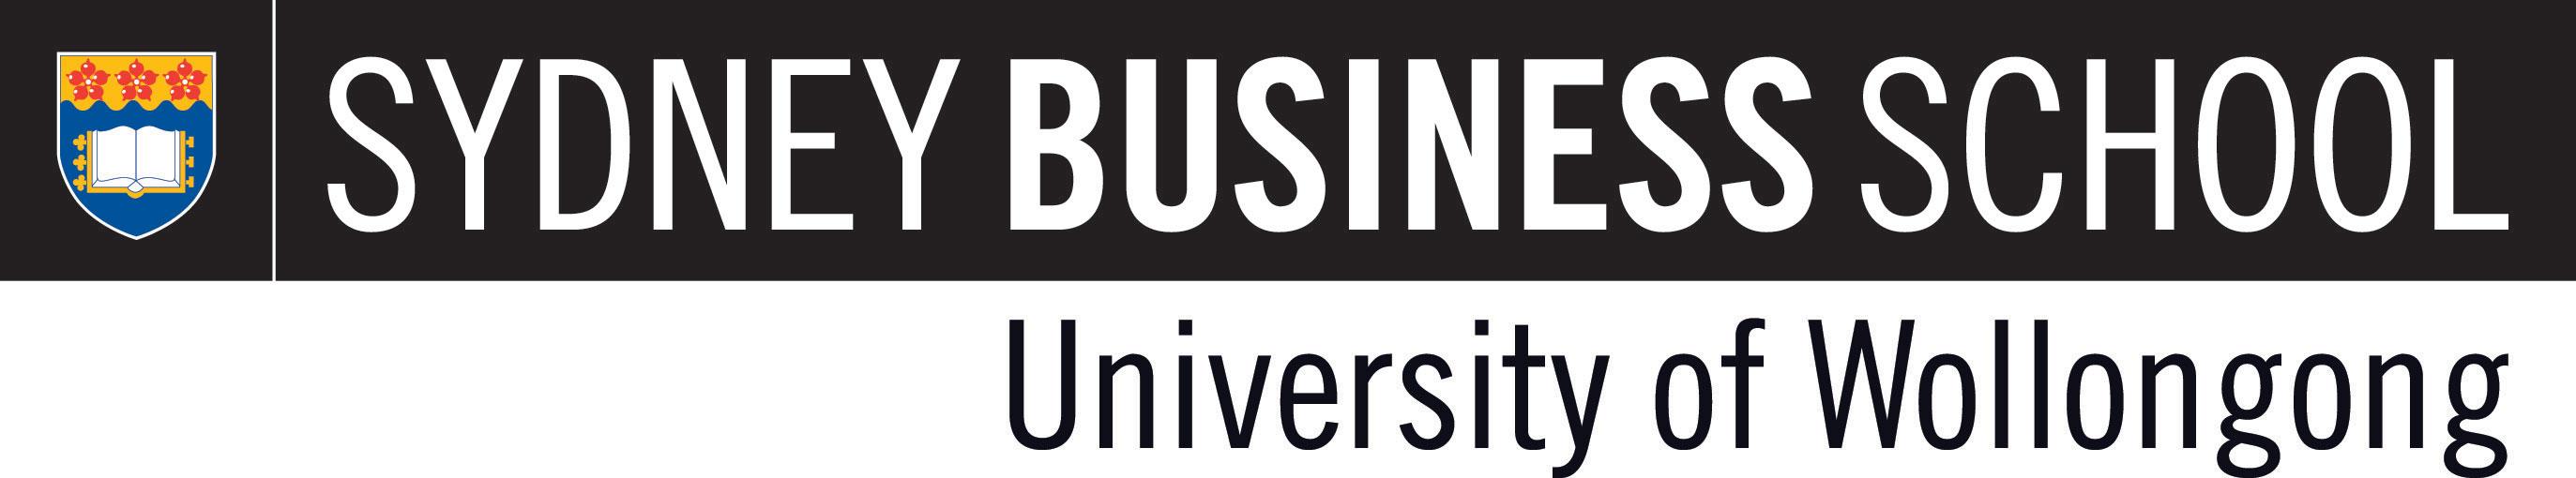 Logo University of Wollongong - Sydney Business School